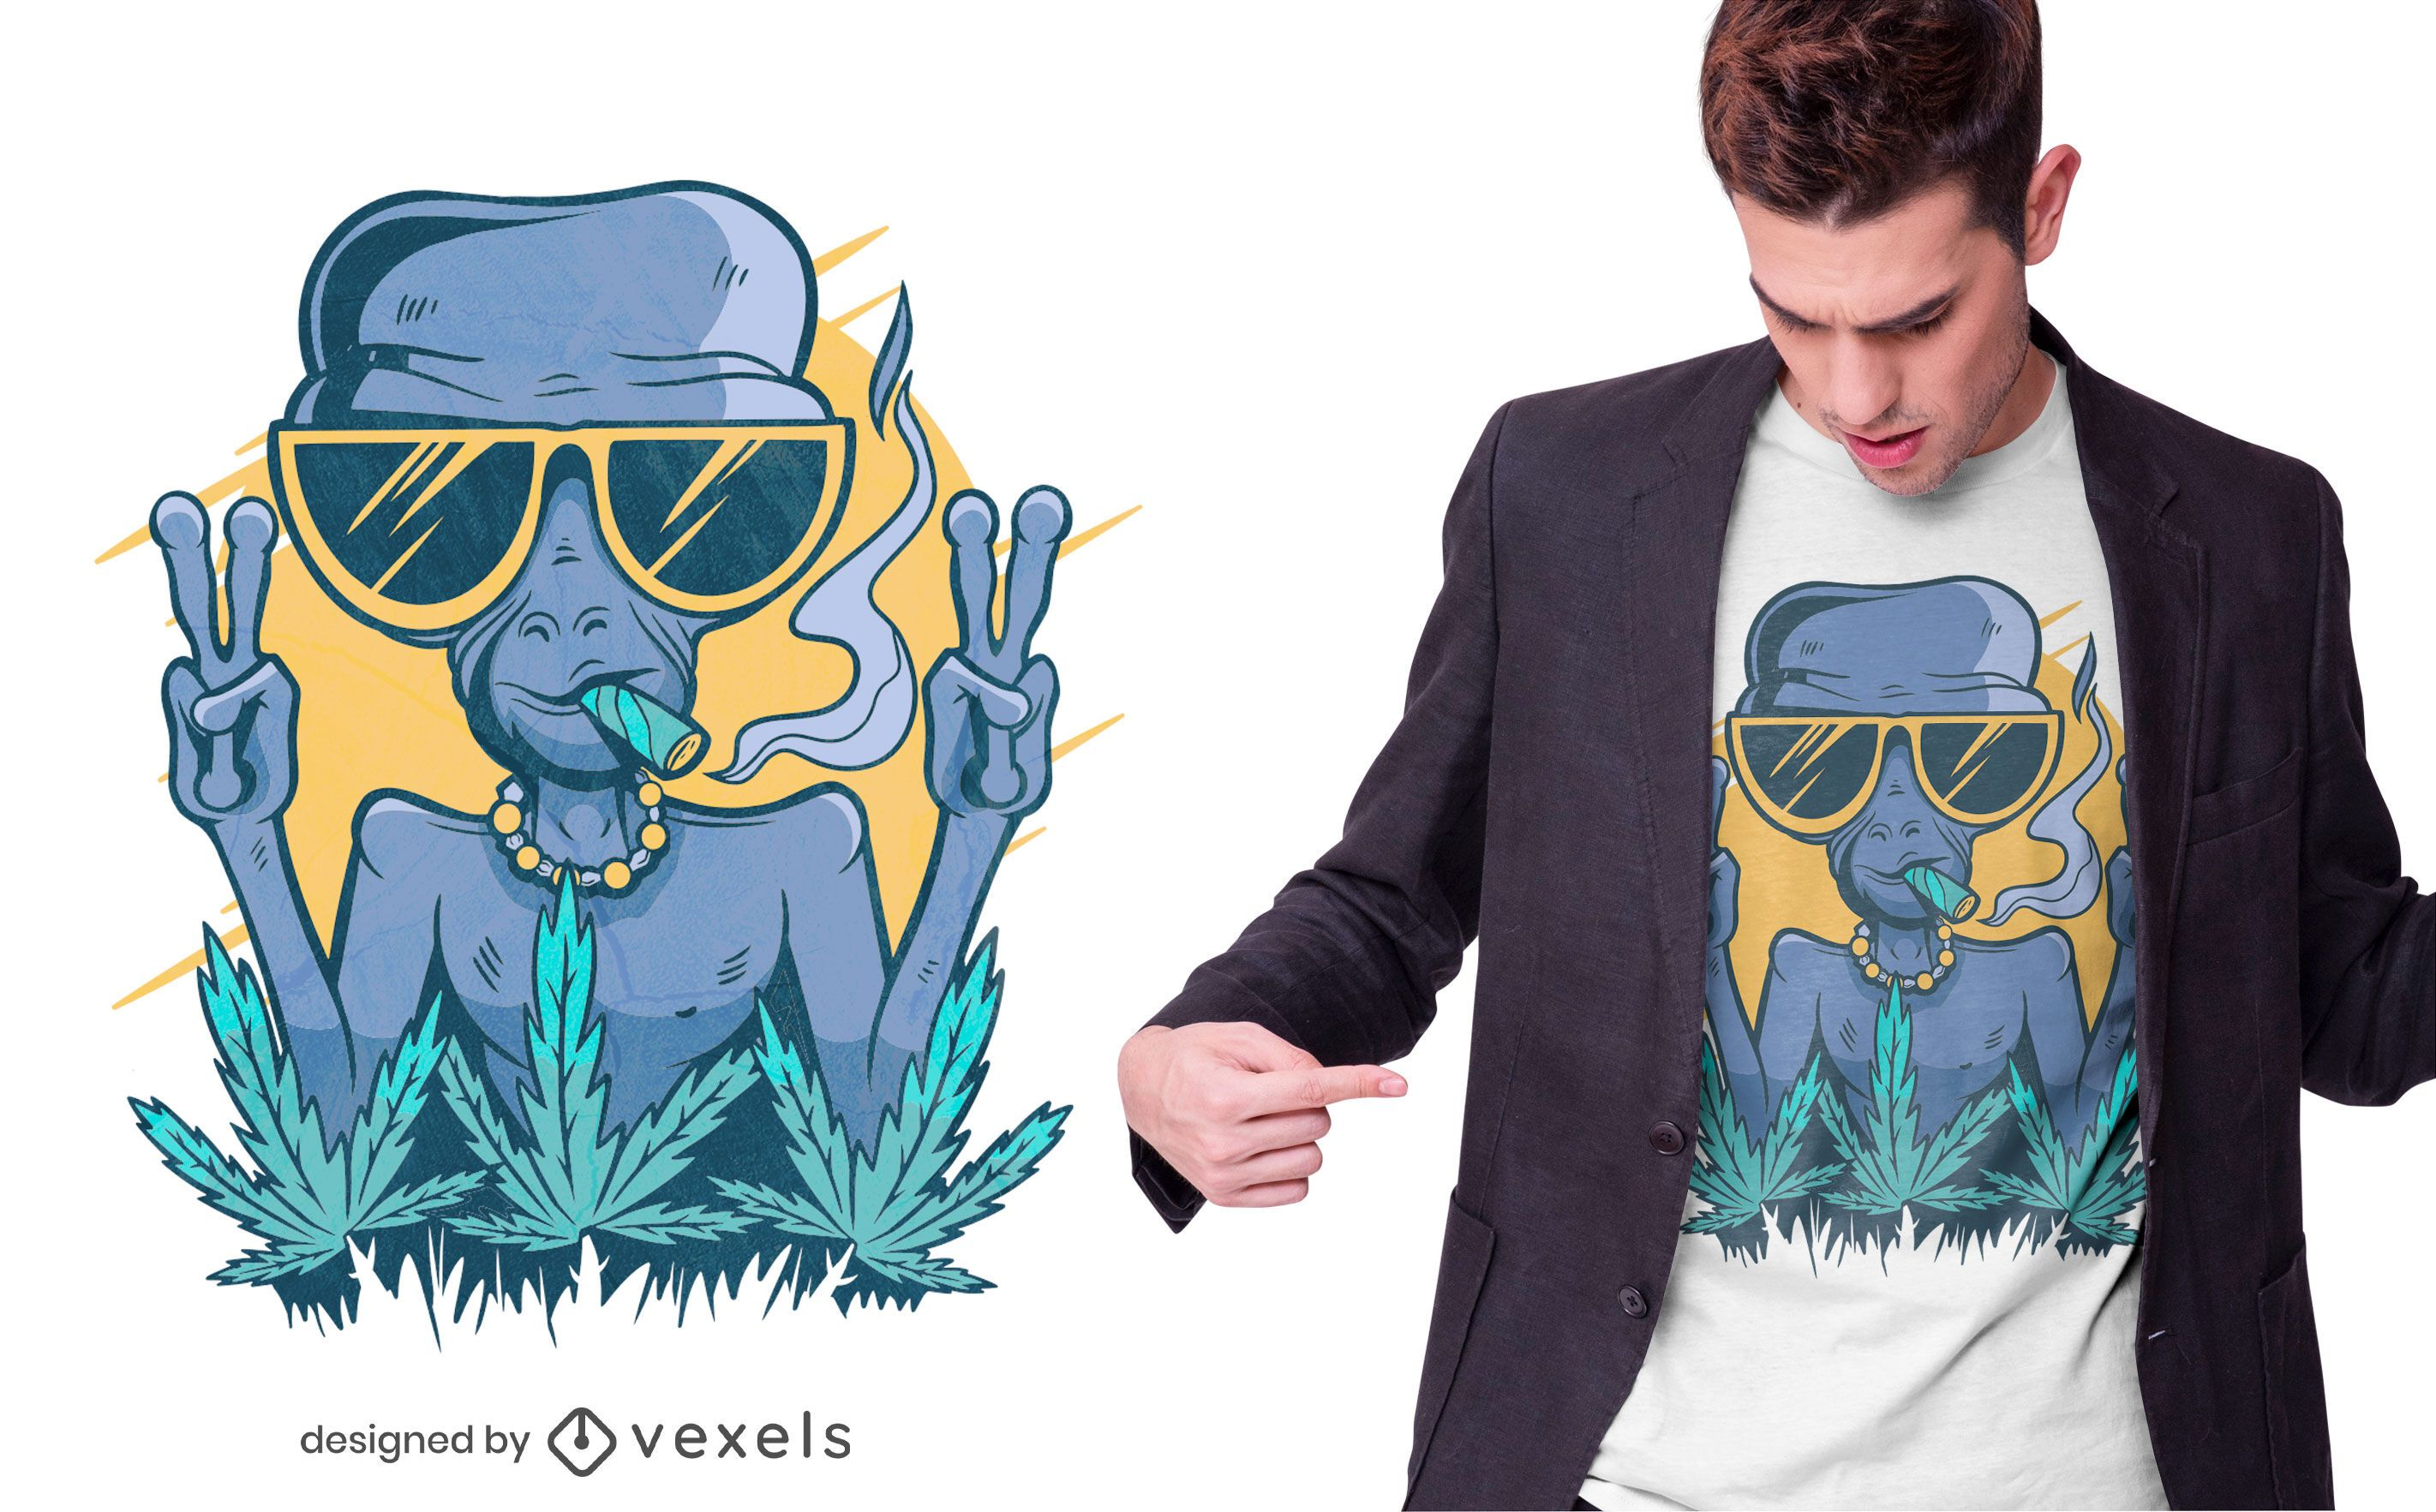 Alien joint t-shirt design